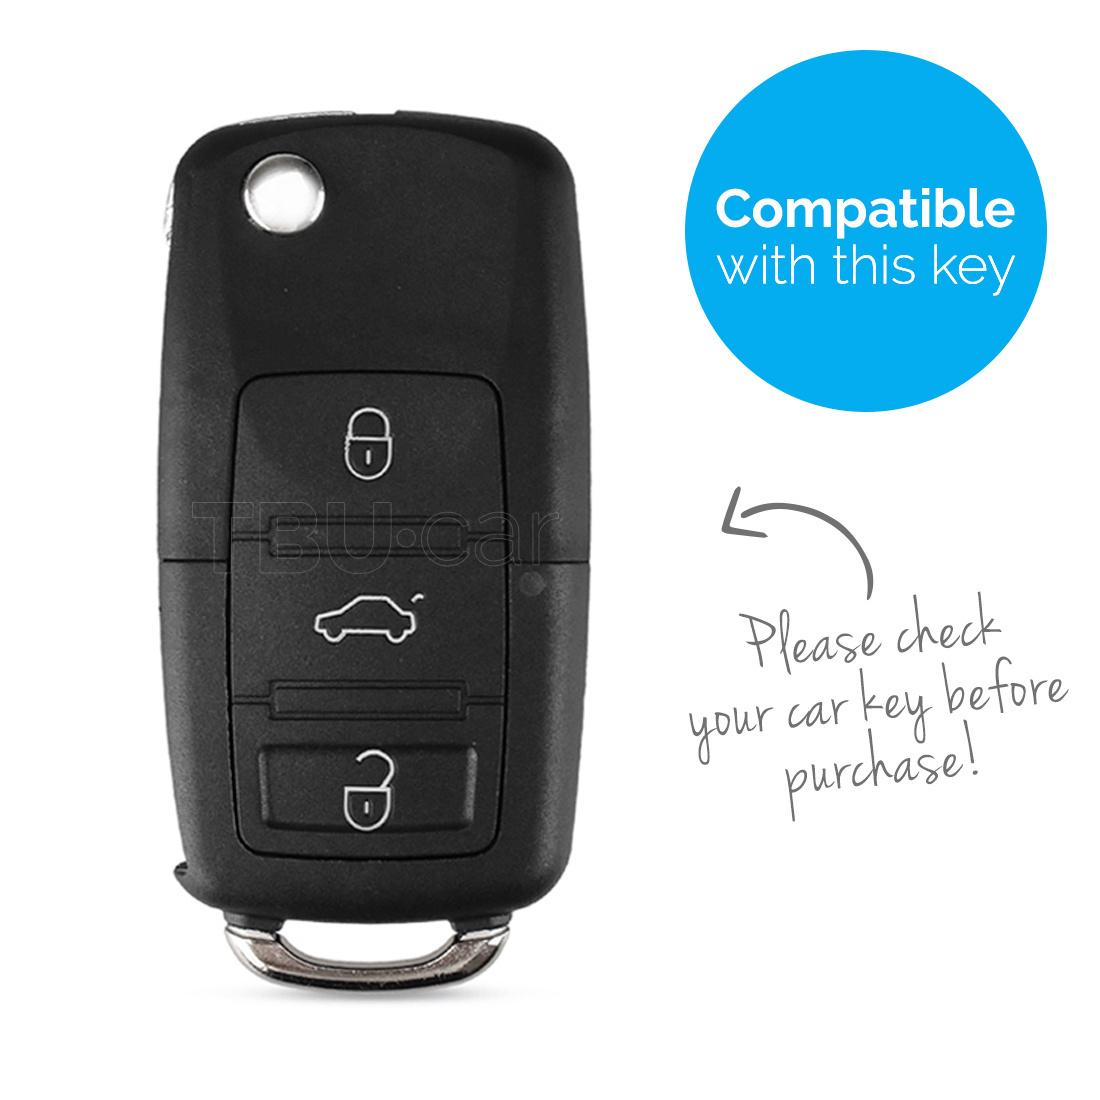 TBU car Audi Sleutel Cover - Silicone sleutelhoesje - beschermhoesje autosleutel - Rood